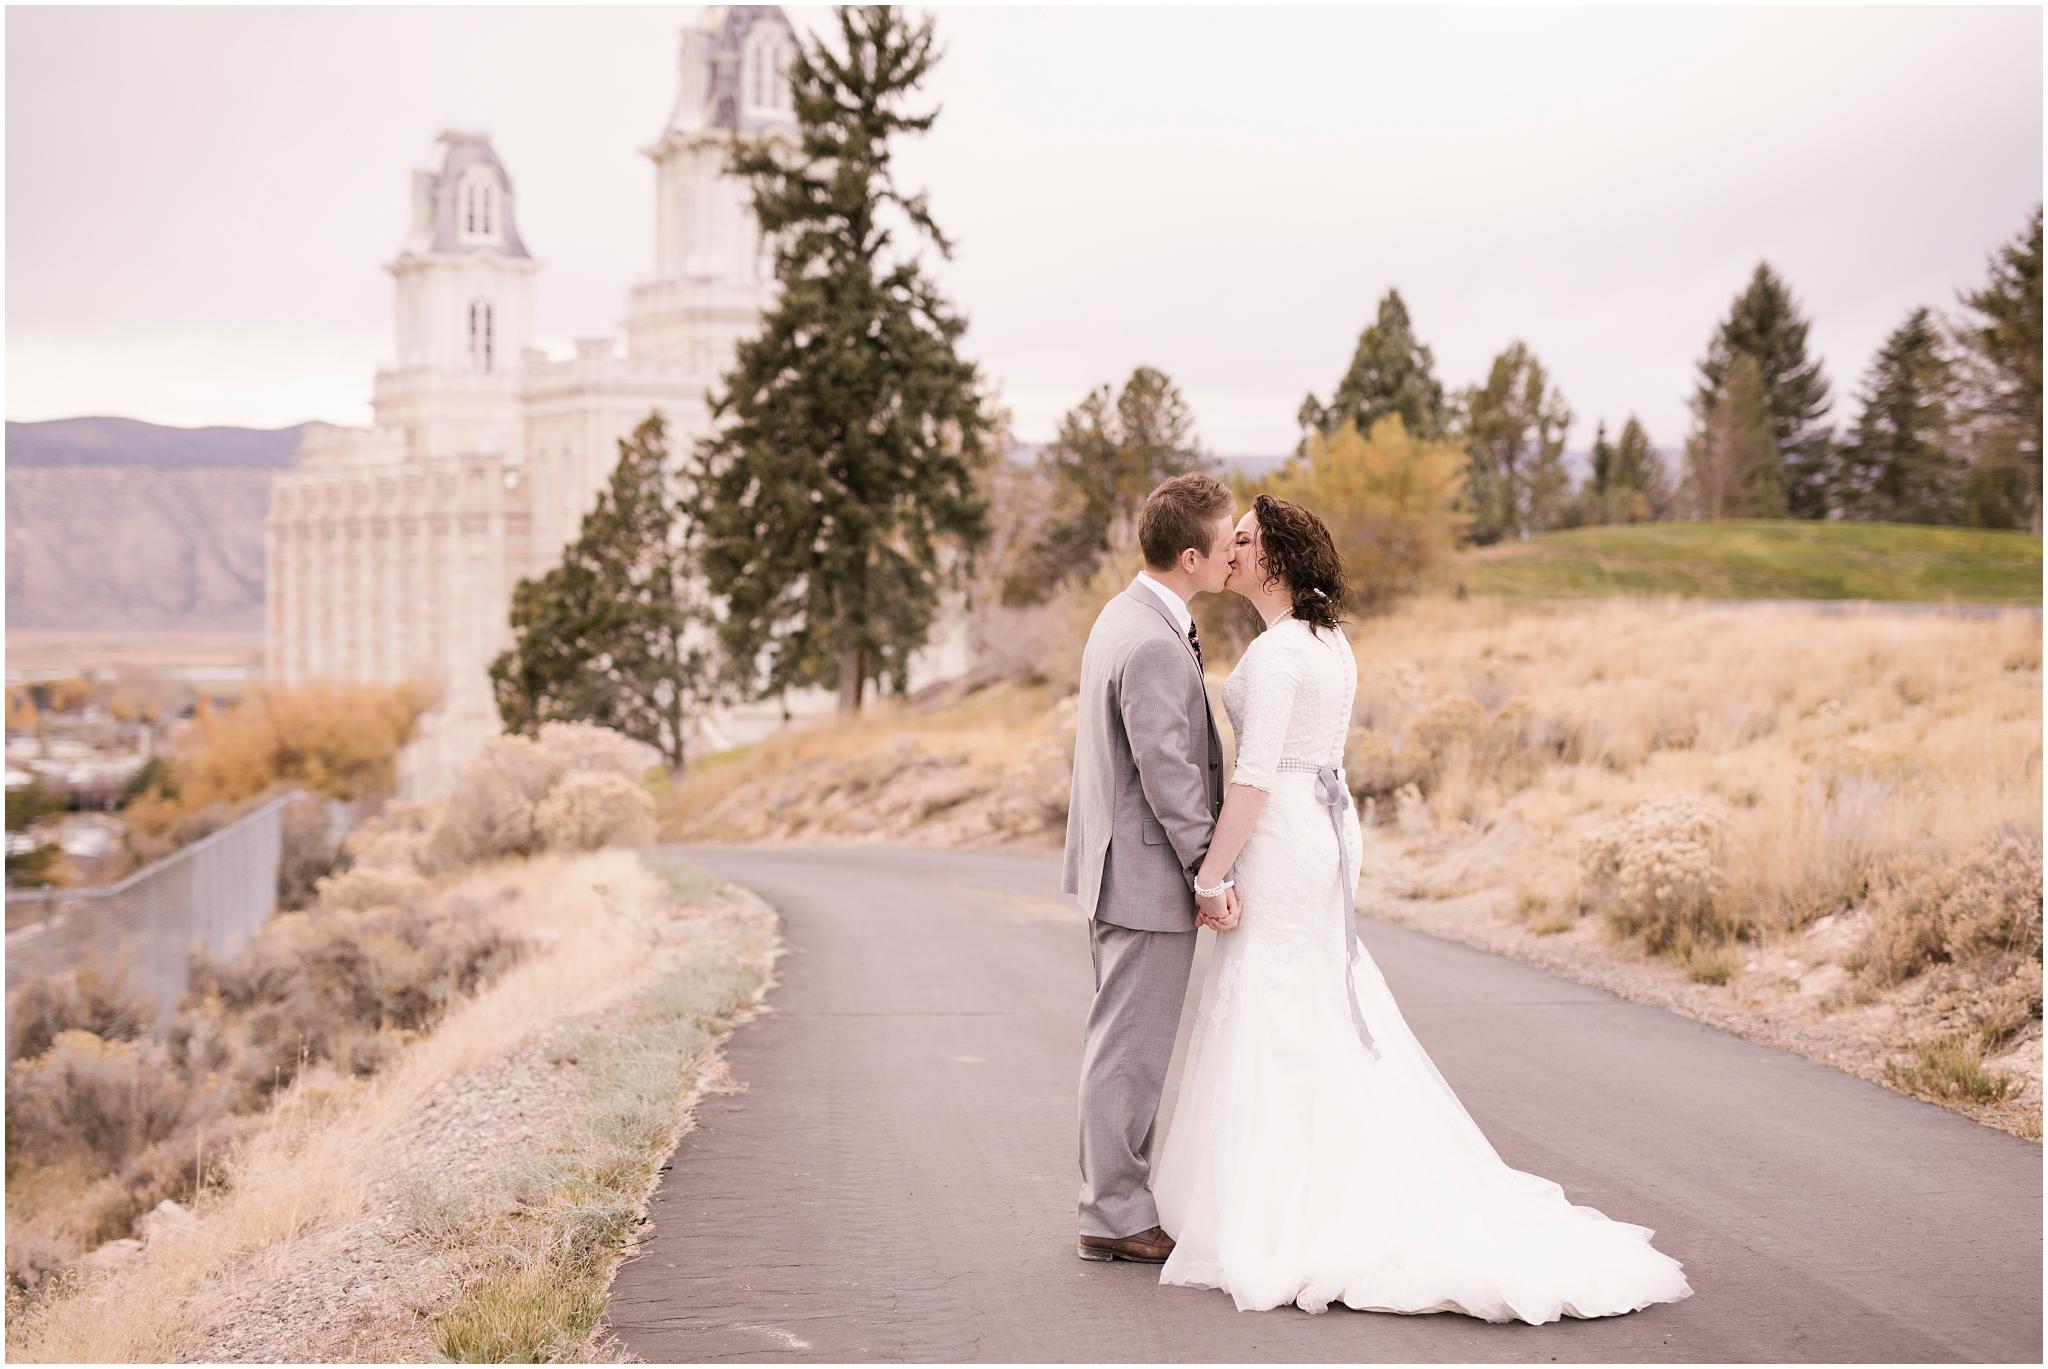 BA-Bridals-160_Lizzie-B-Imagery-Utah-Wedding-Photographer-Central-Utah-Photographer-Utah-County-Manti-Utah-Temple.jpg